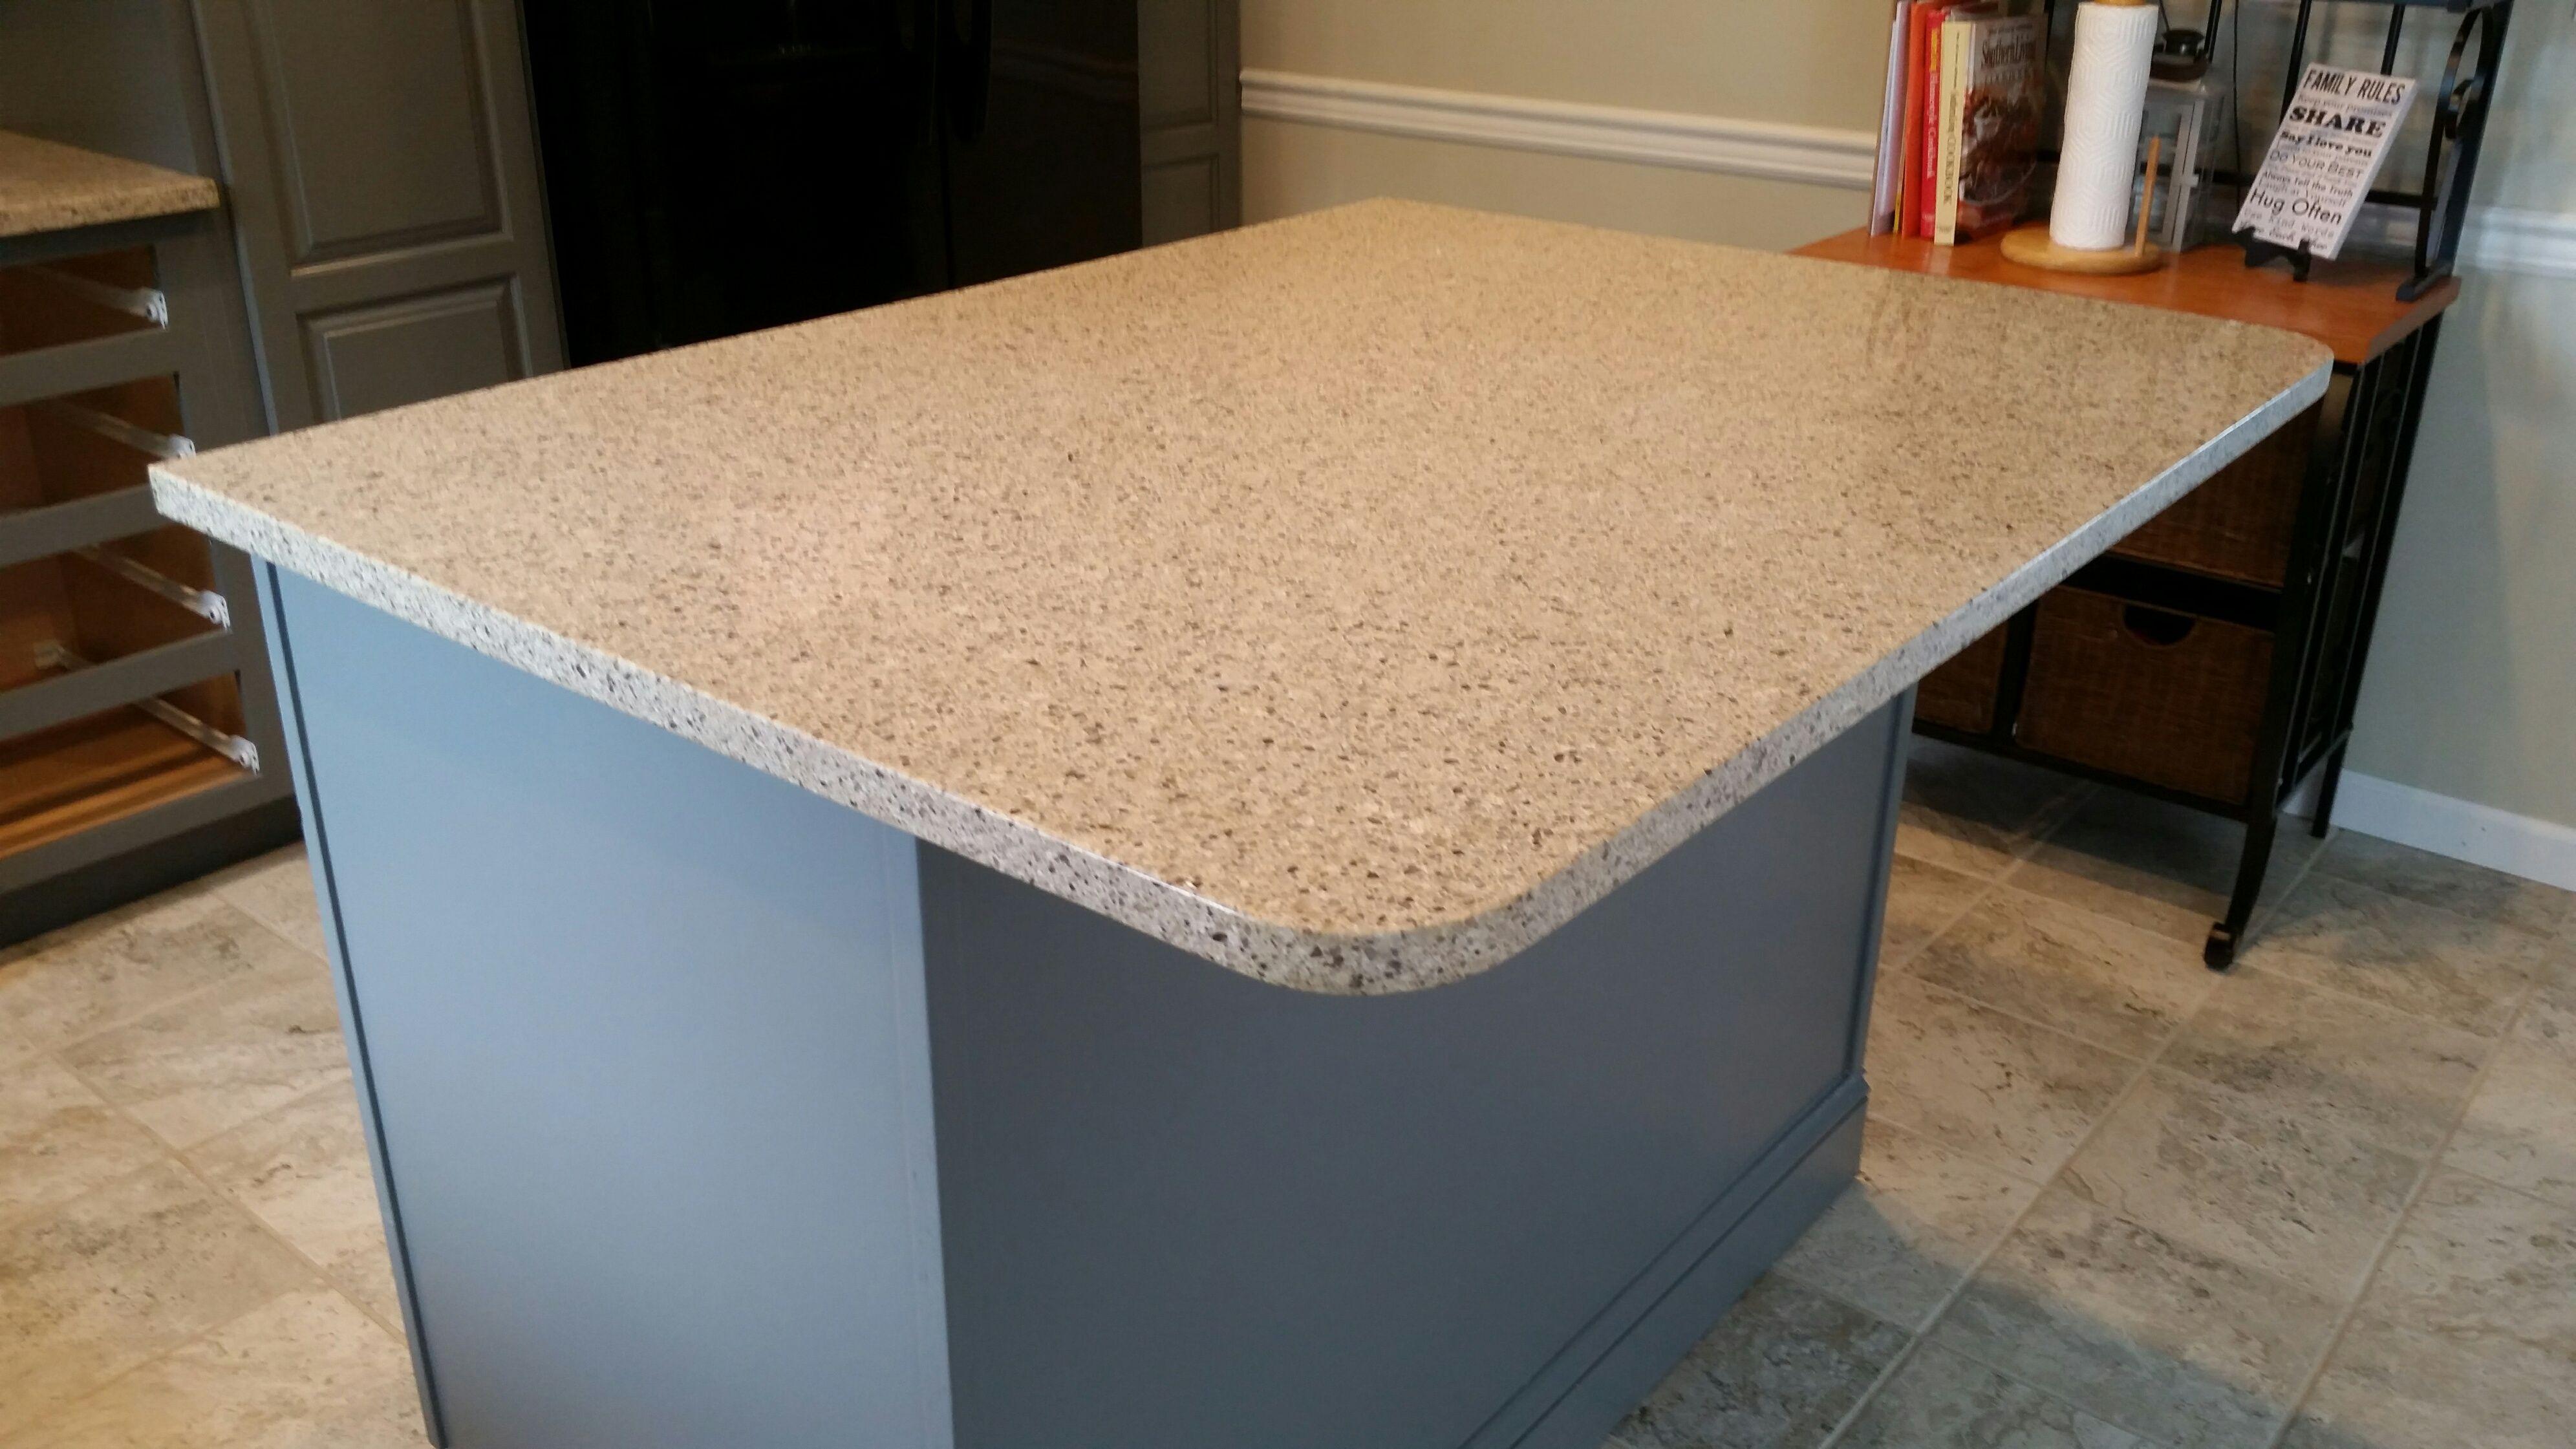 Silver Lake Lg Viatera Quartz Kitchen Countertop Install For The